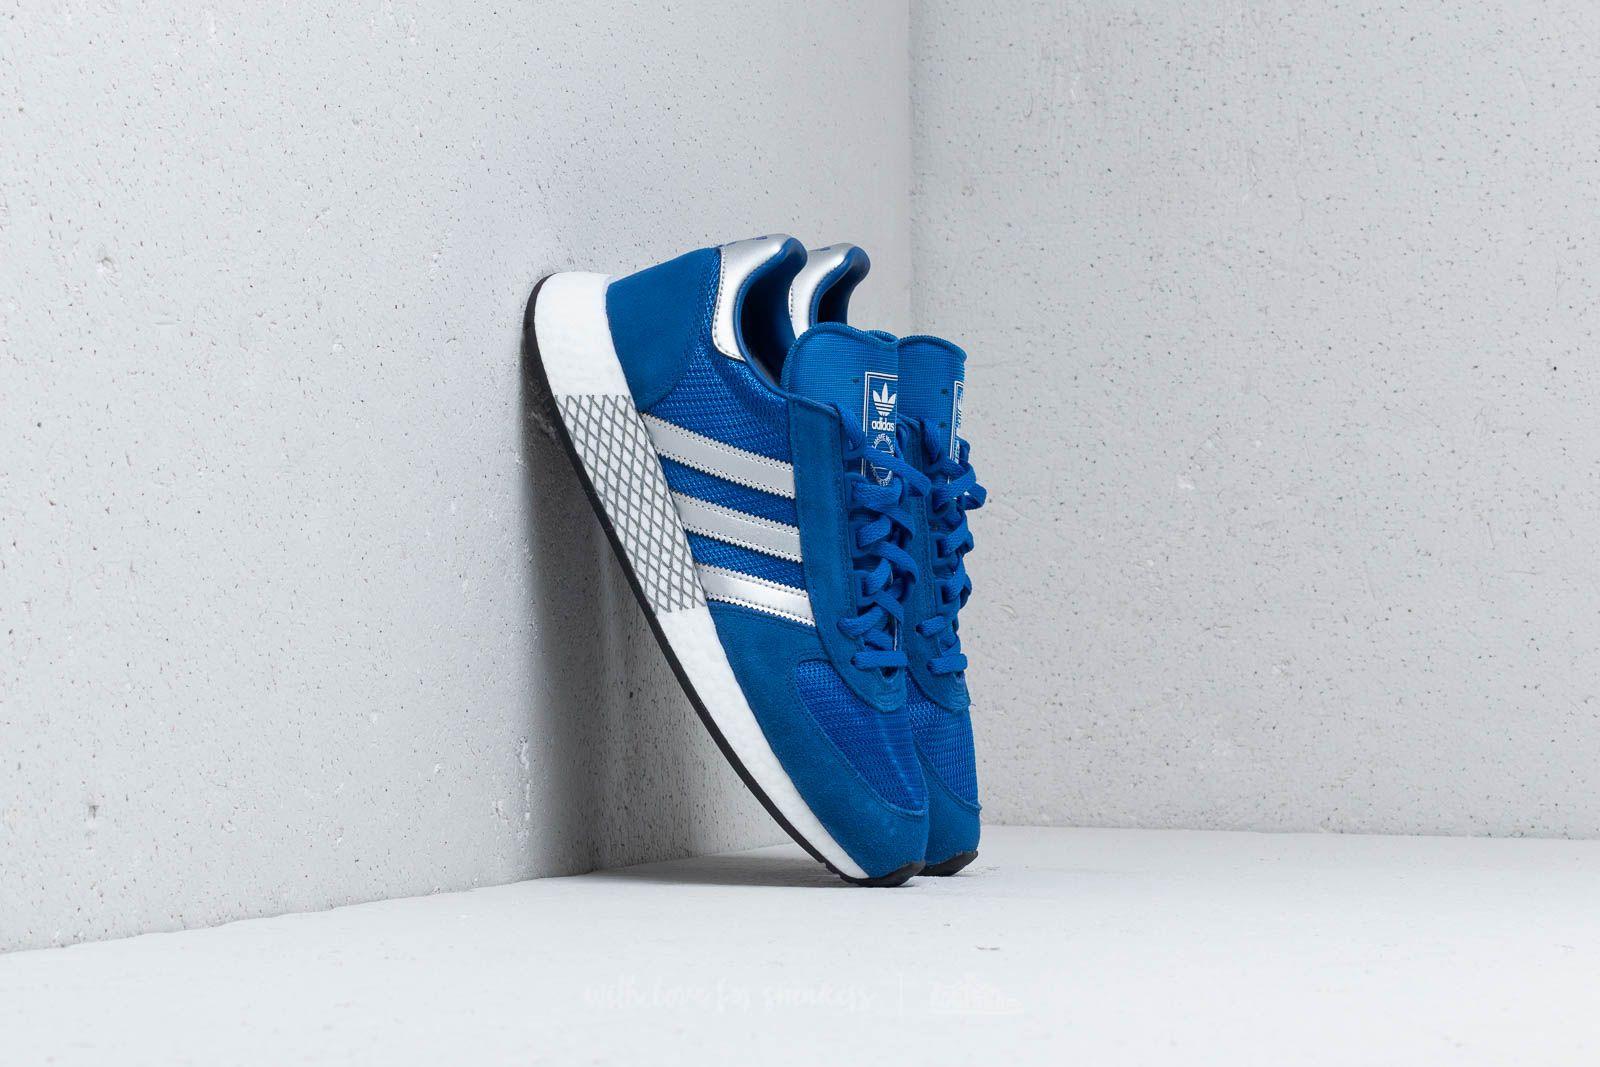 adidas Marathon x 5923